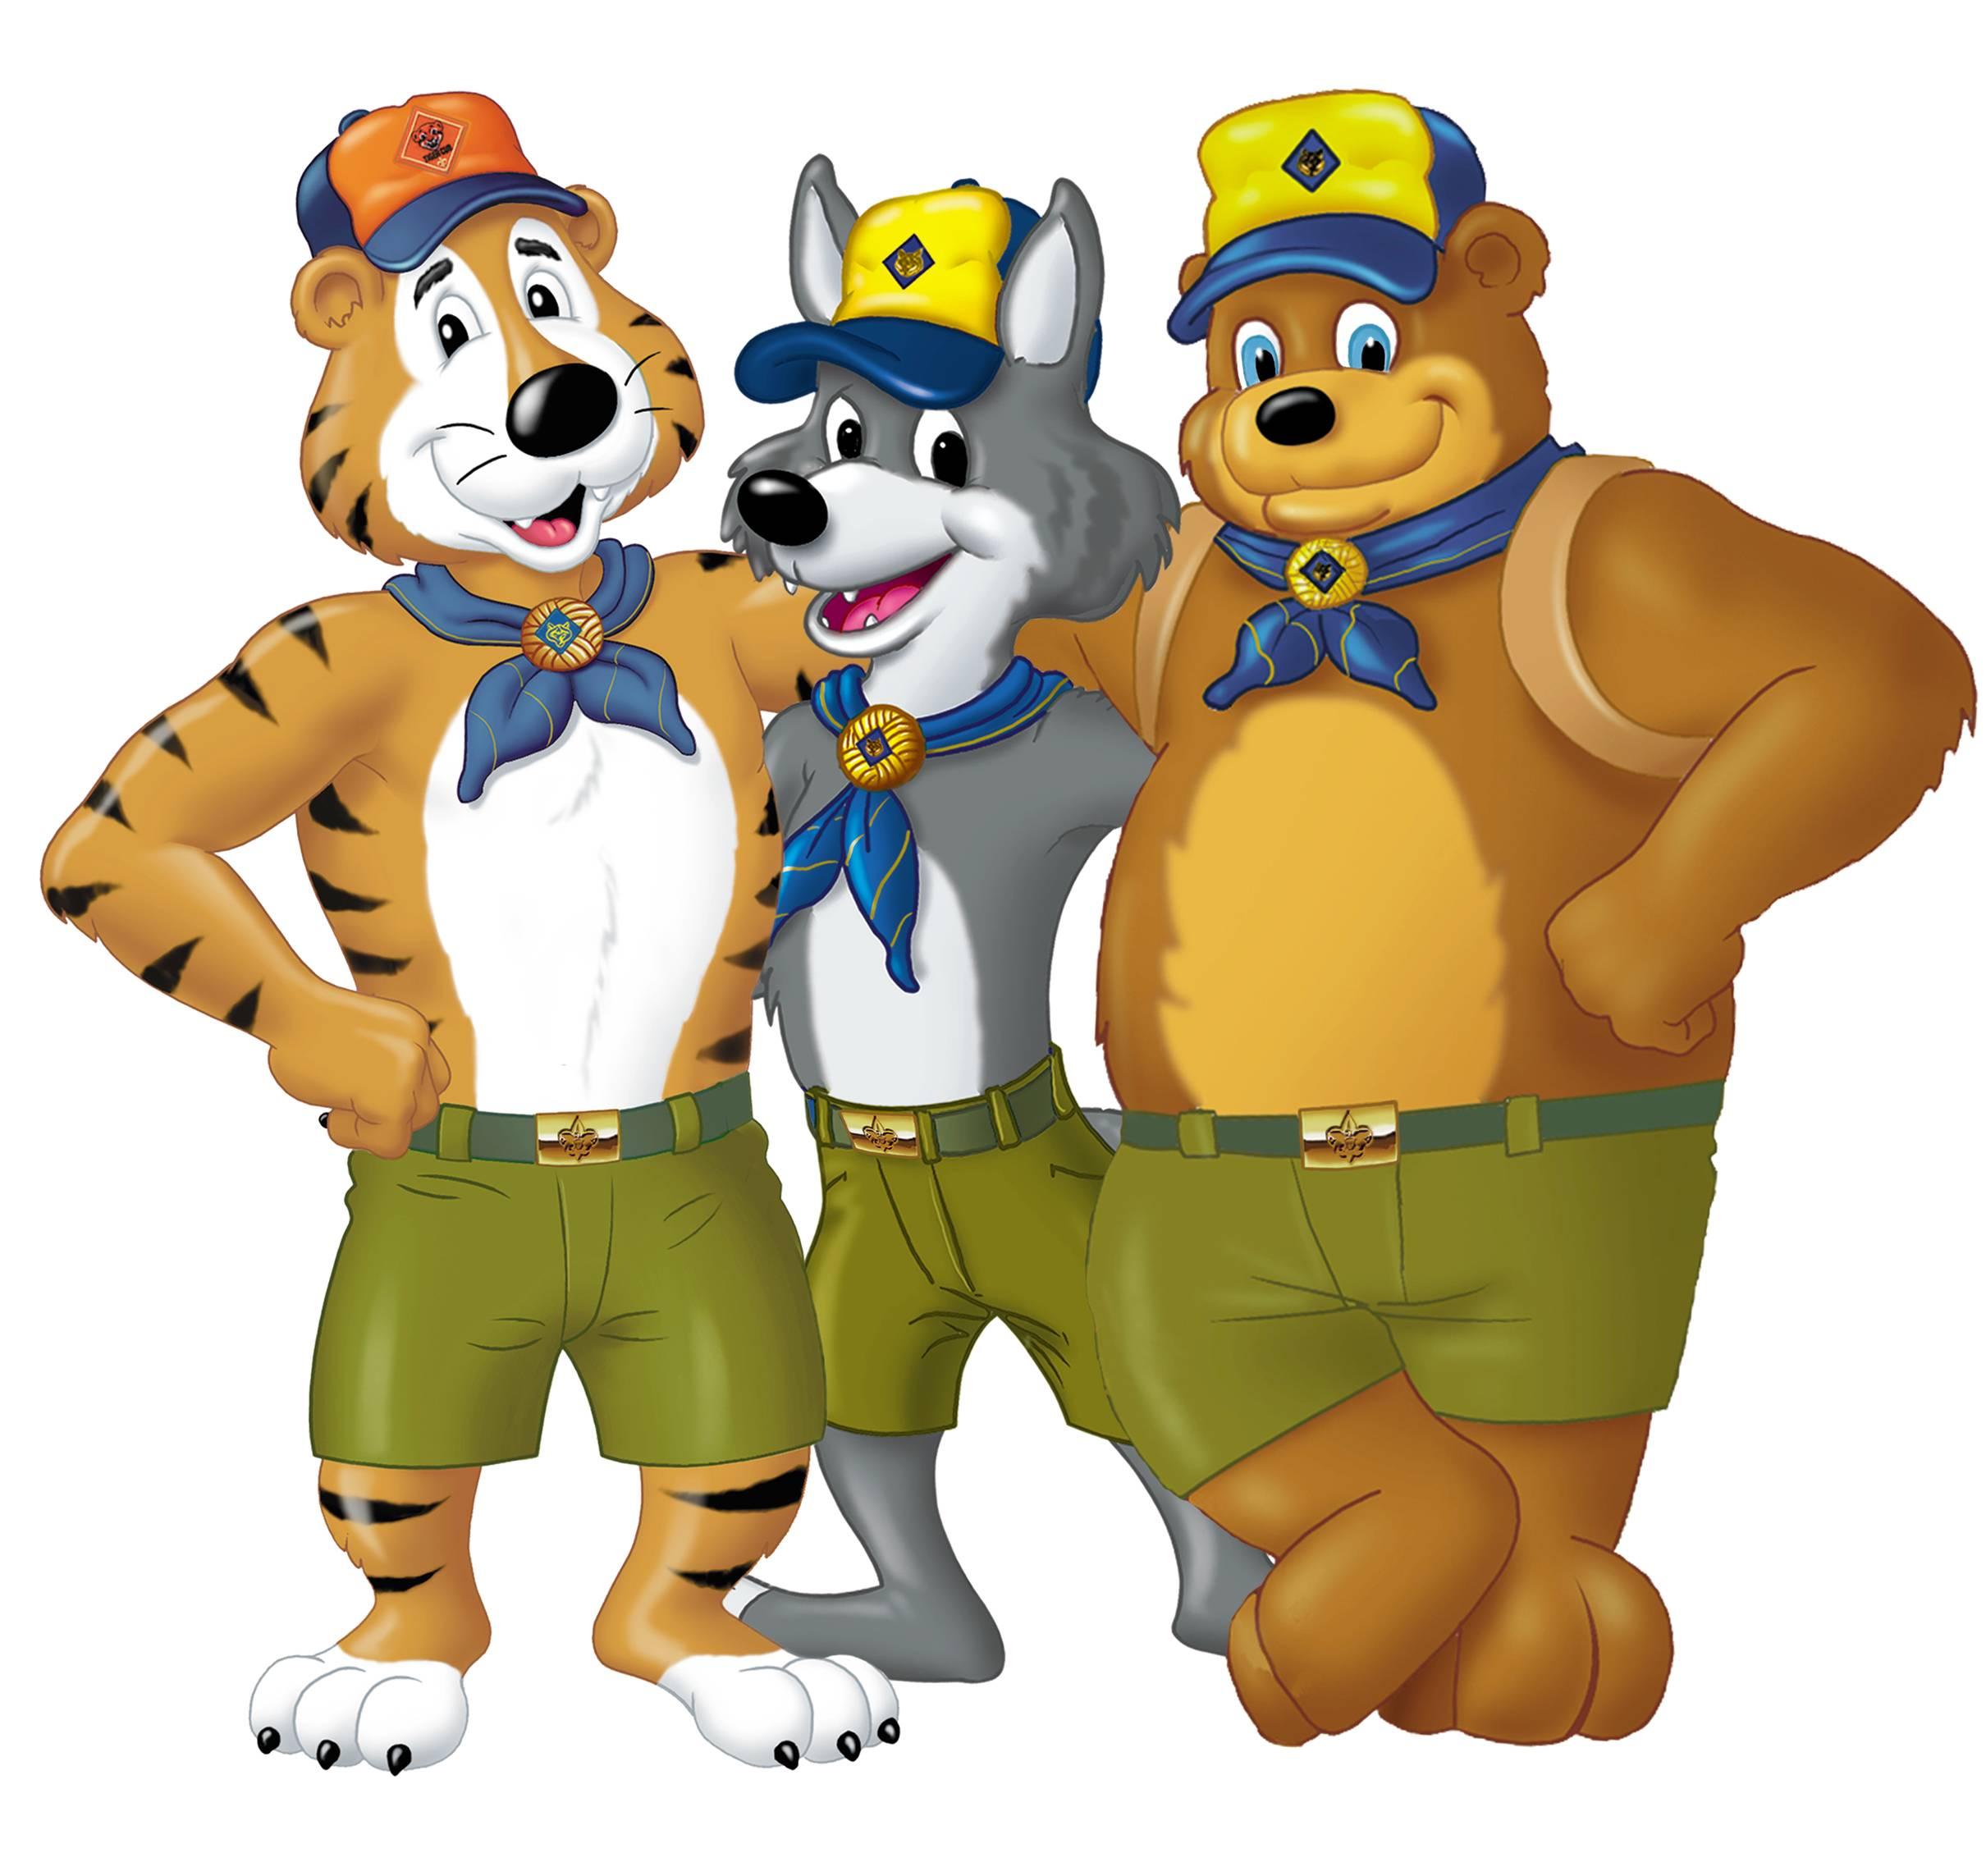 Cub Scout Salute Gold Cub Scout Emblem Baloo Akela Baloo